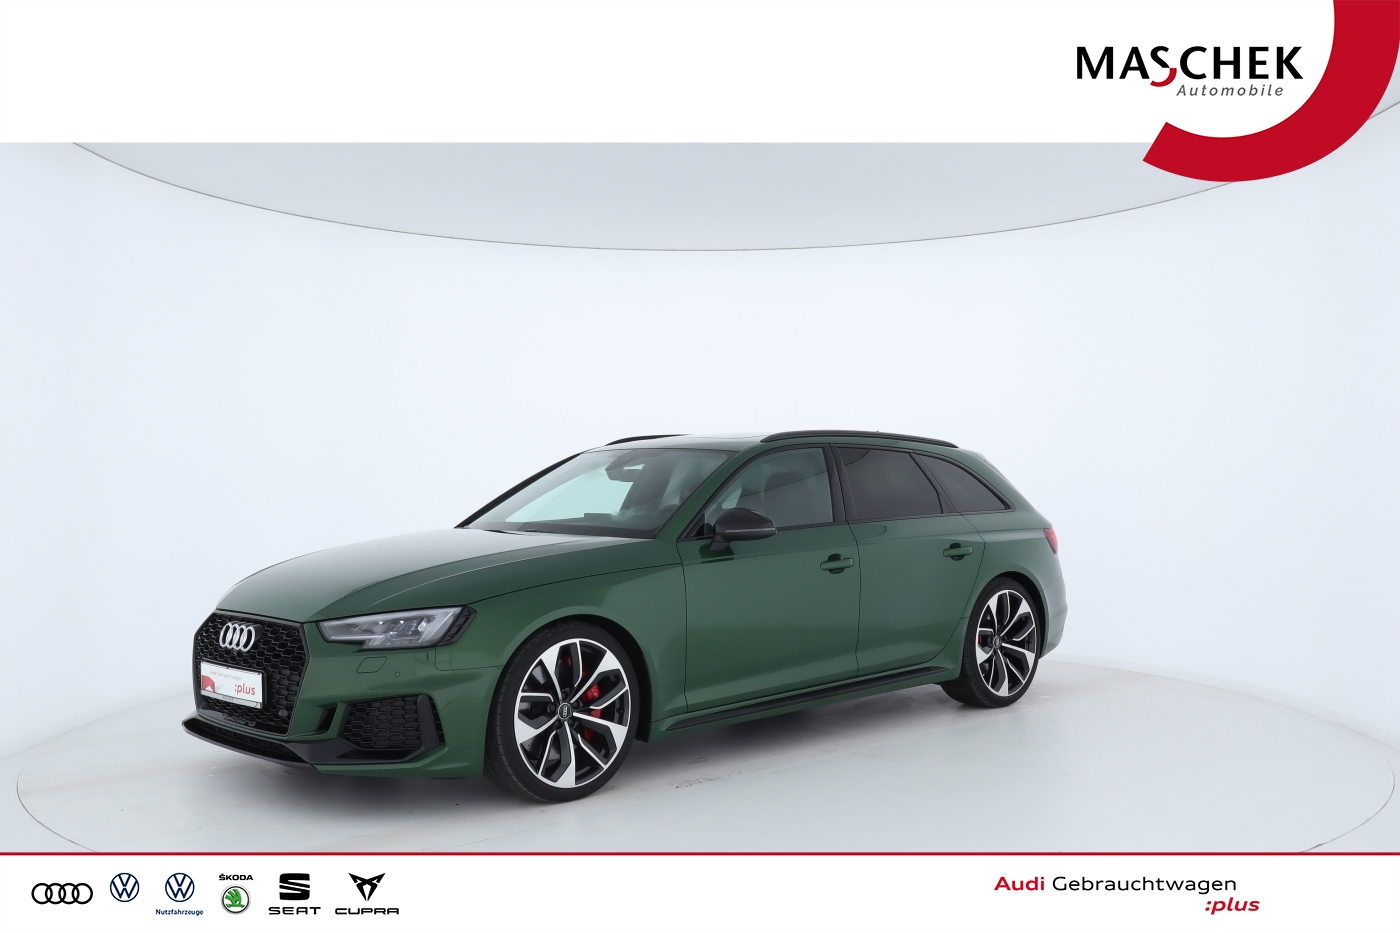 Audi RS 4 Avant RSAGA Matrix VC Pano Leder BlackEditi, Jahr 2017, Benzin